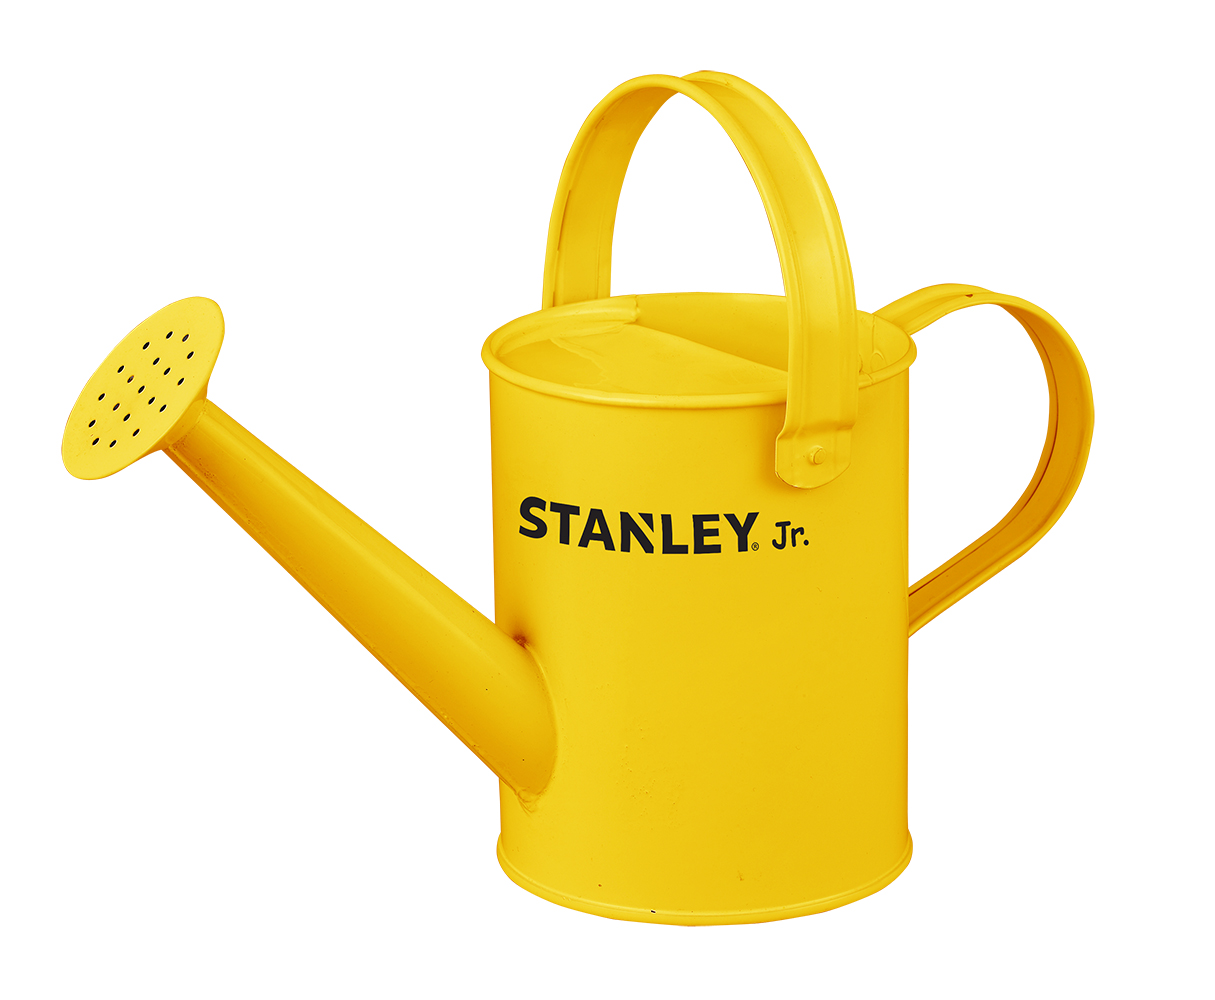 Stanley Jr. - Arrosoir